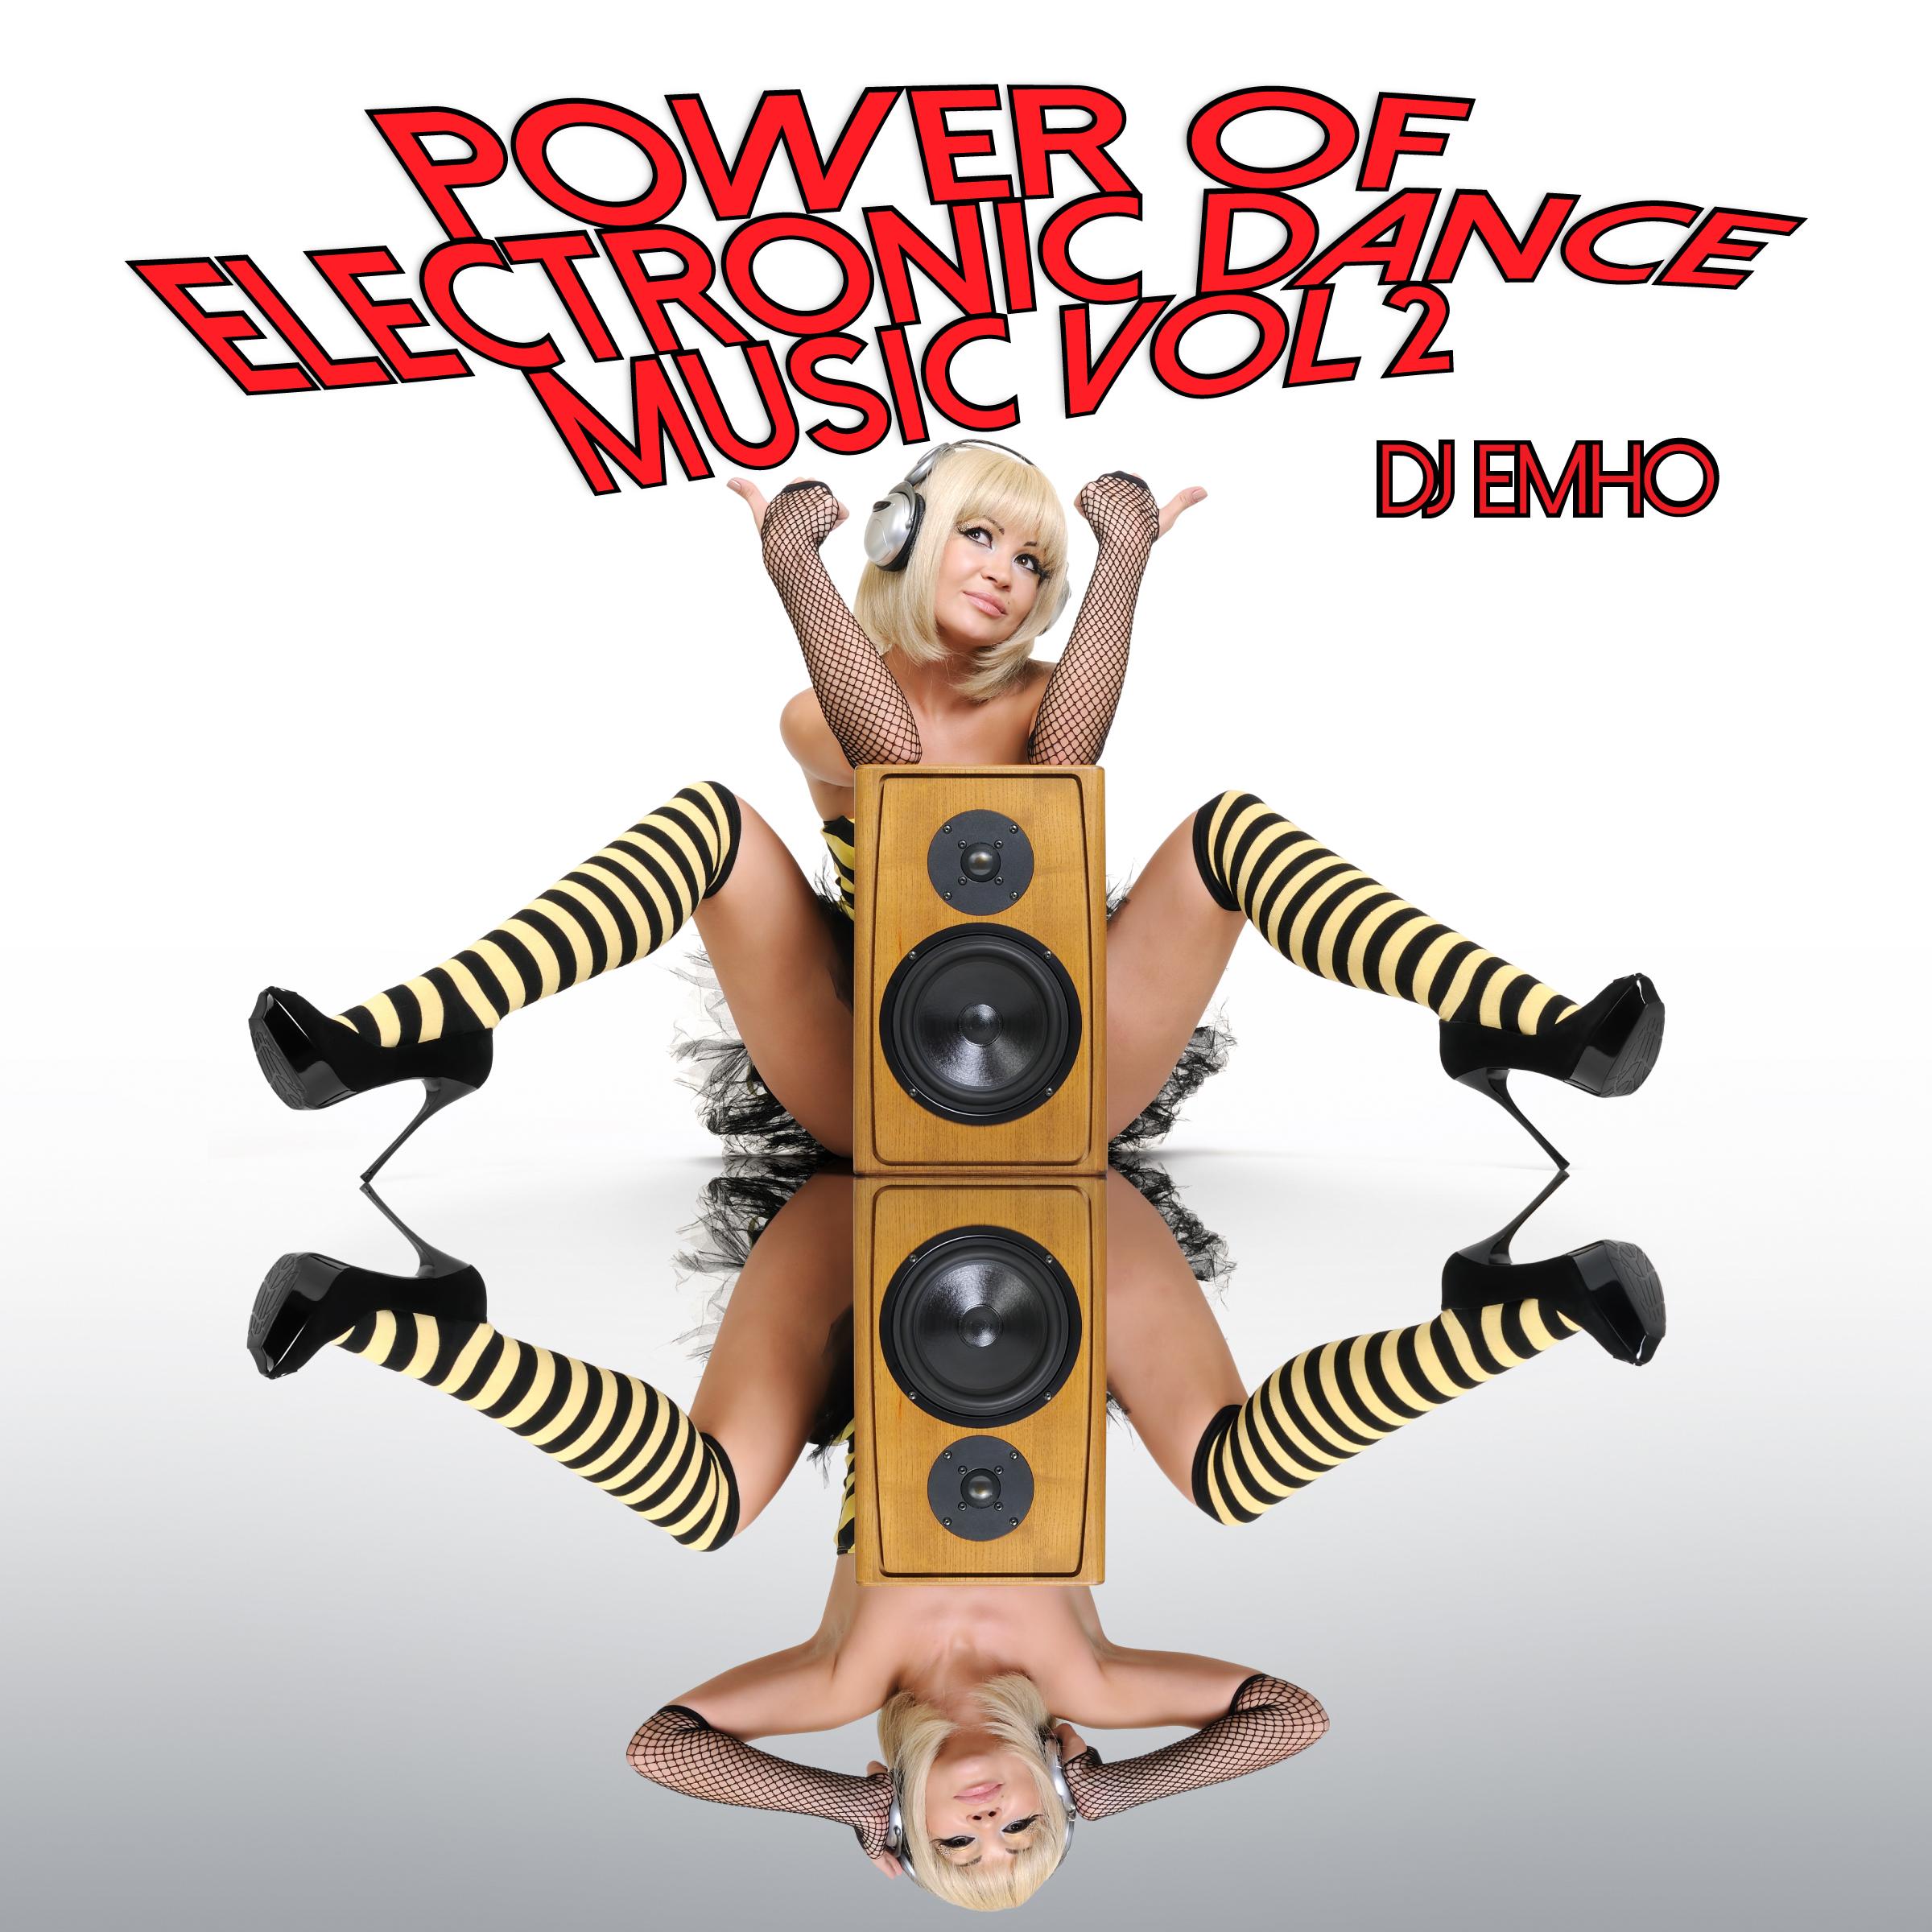 Power of electronic dance music volume 2